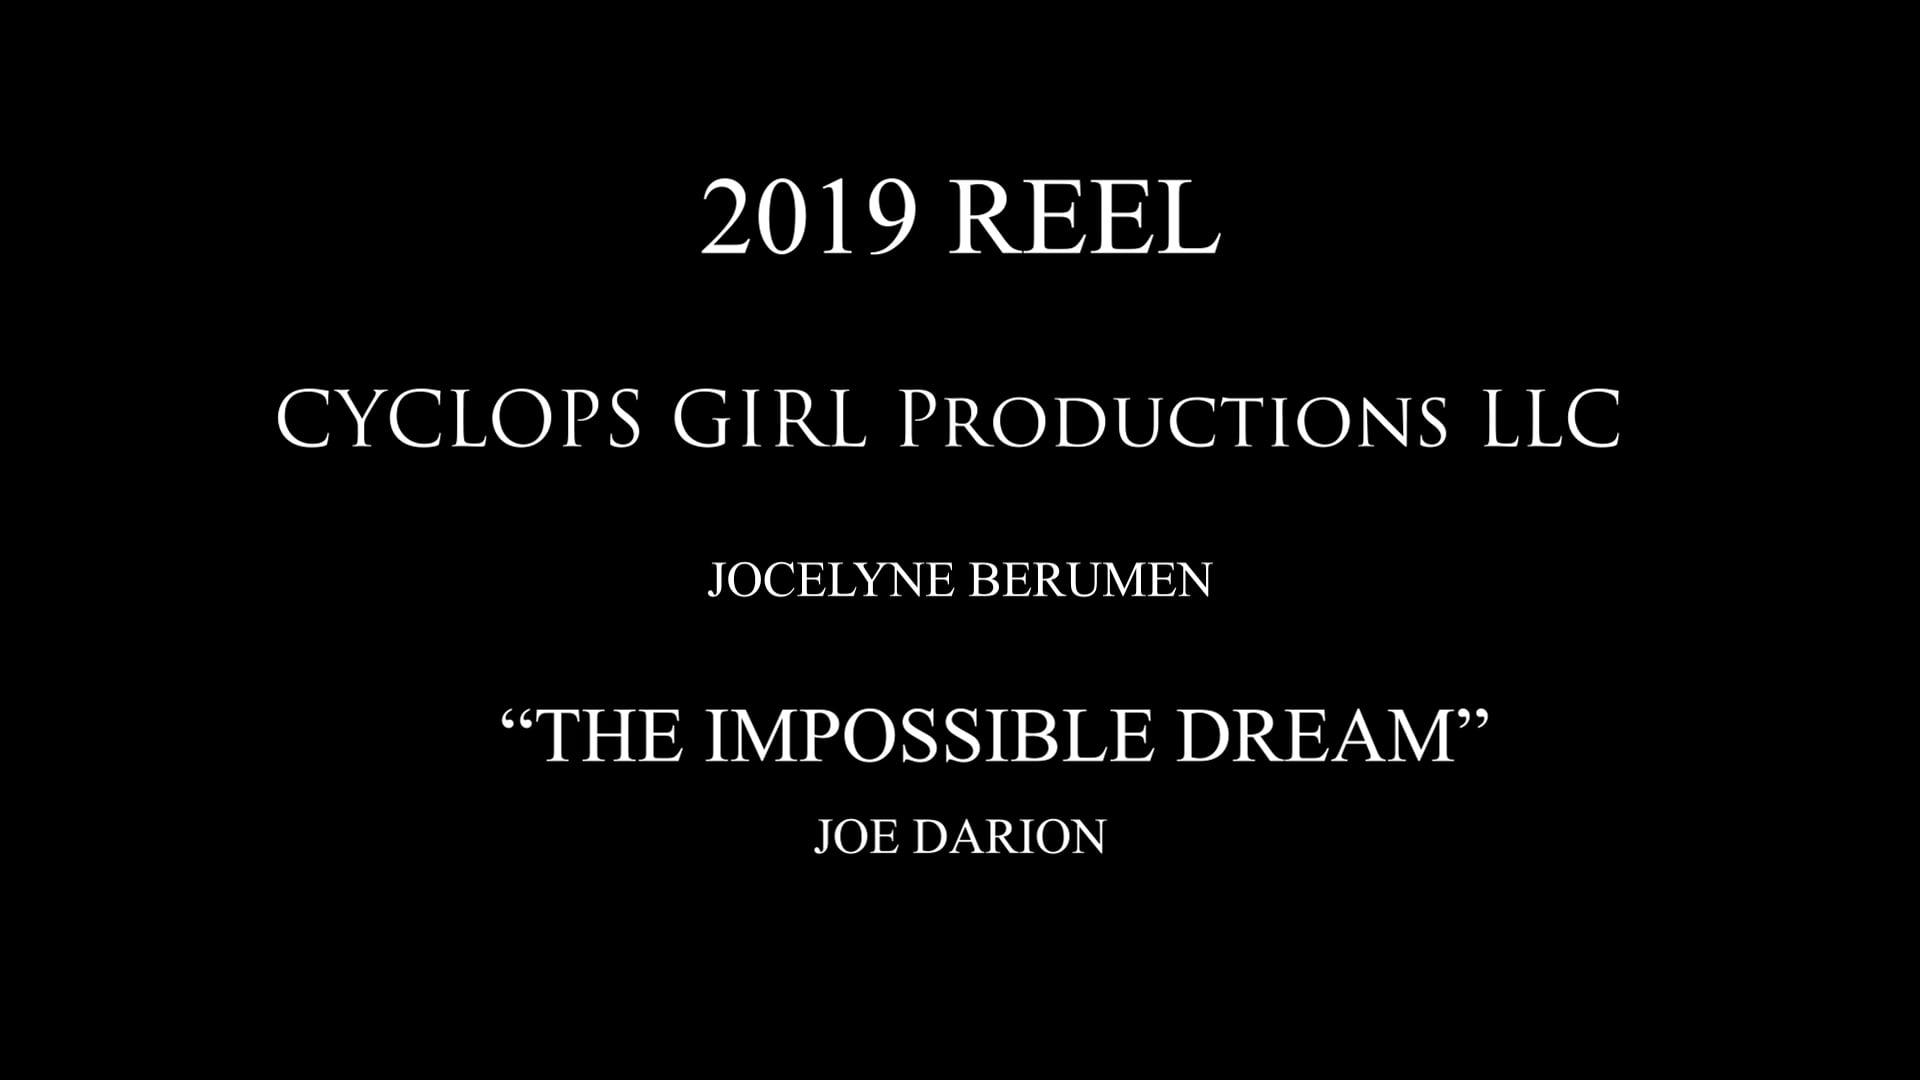 2019 Reel Cyclops Girl Productions